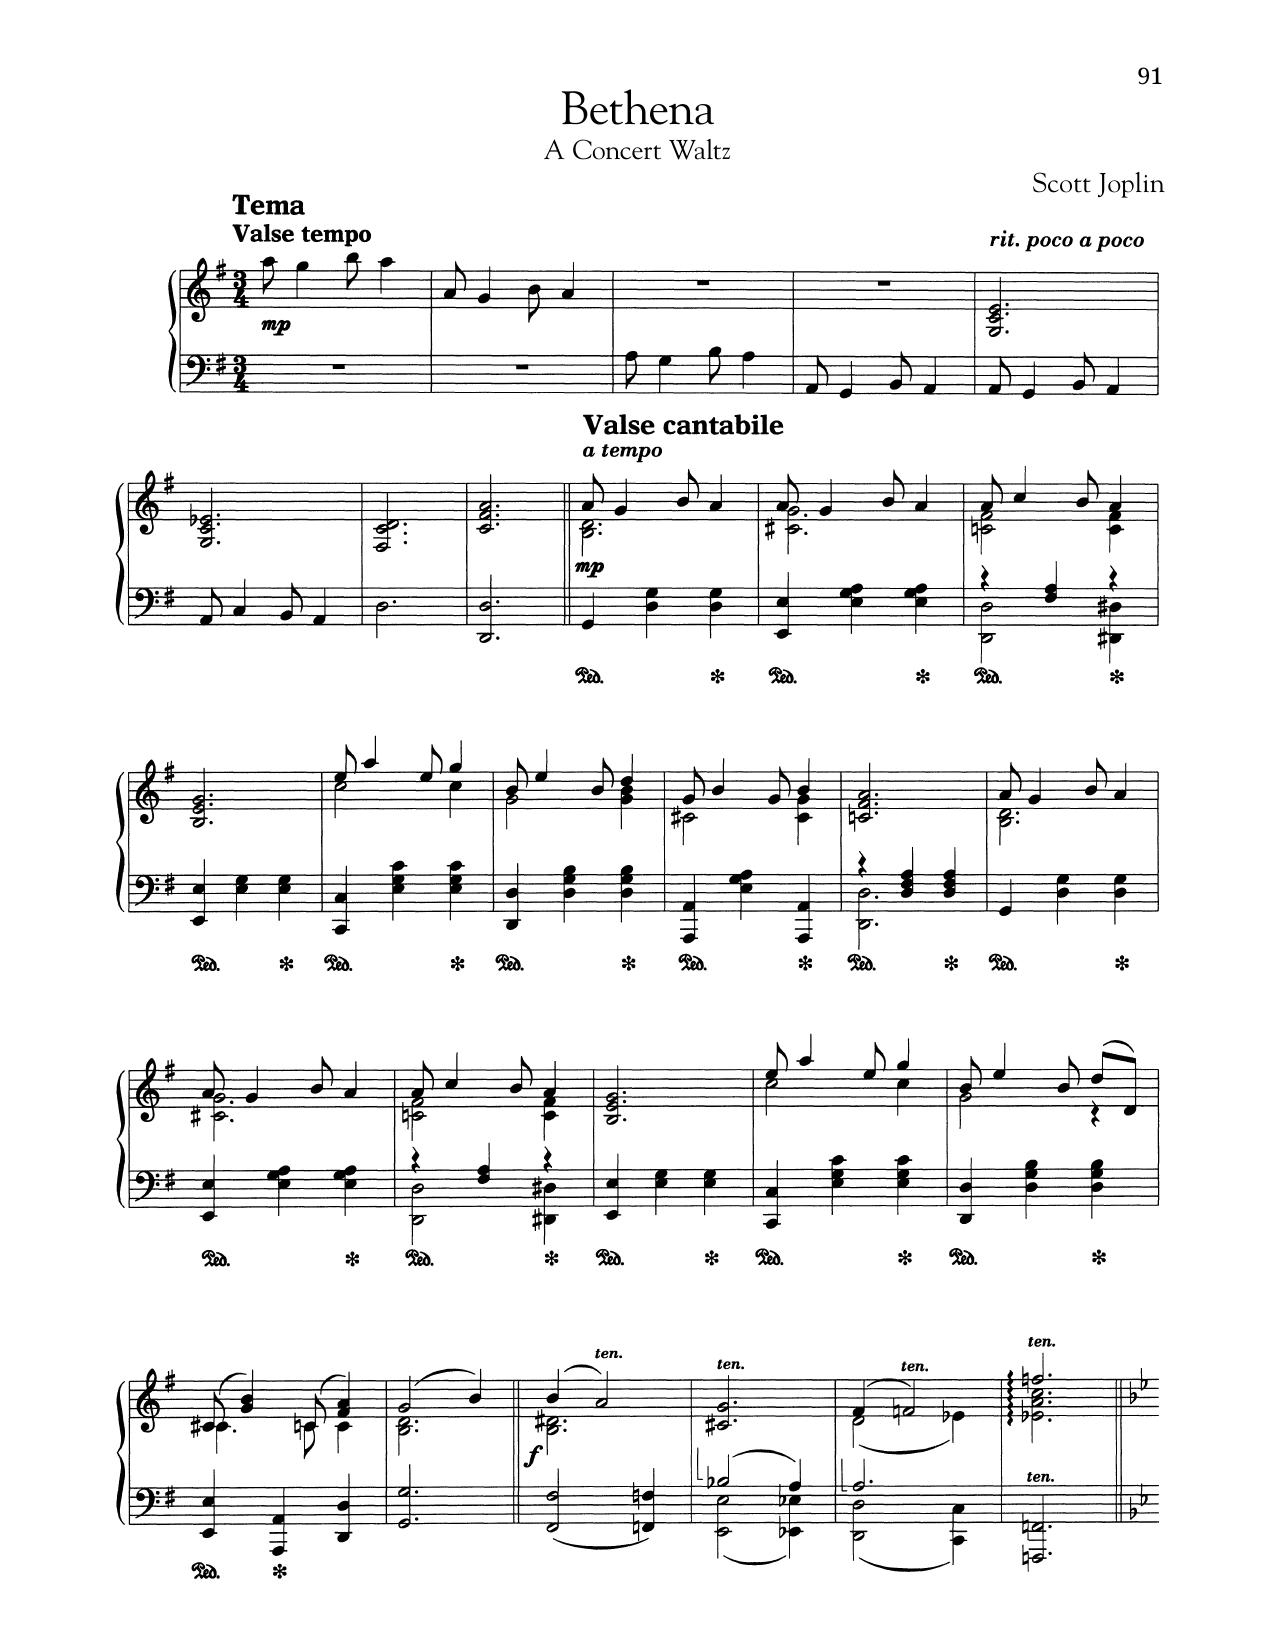 Bethena (Ragtime Waltz) Sheet Music